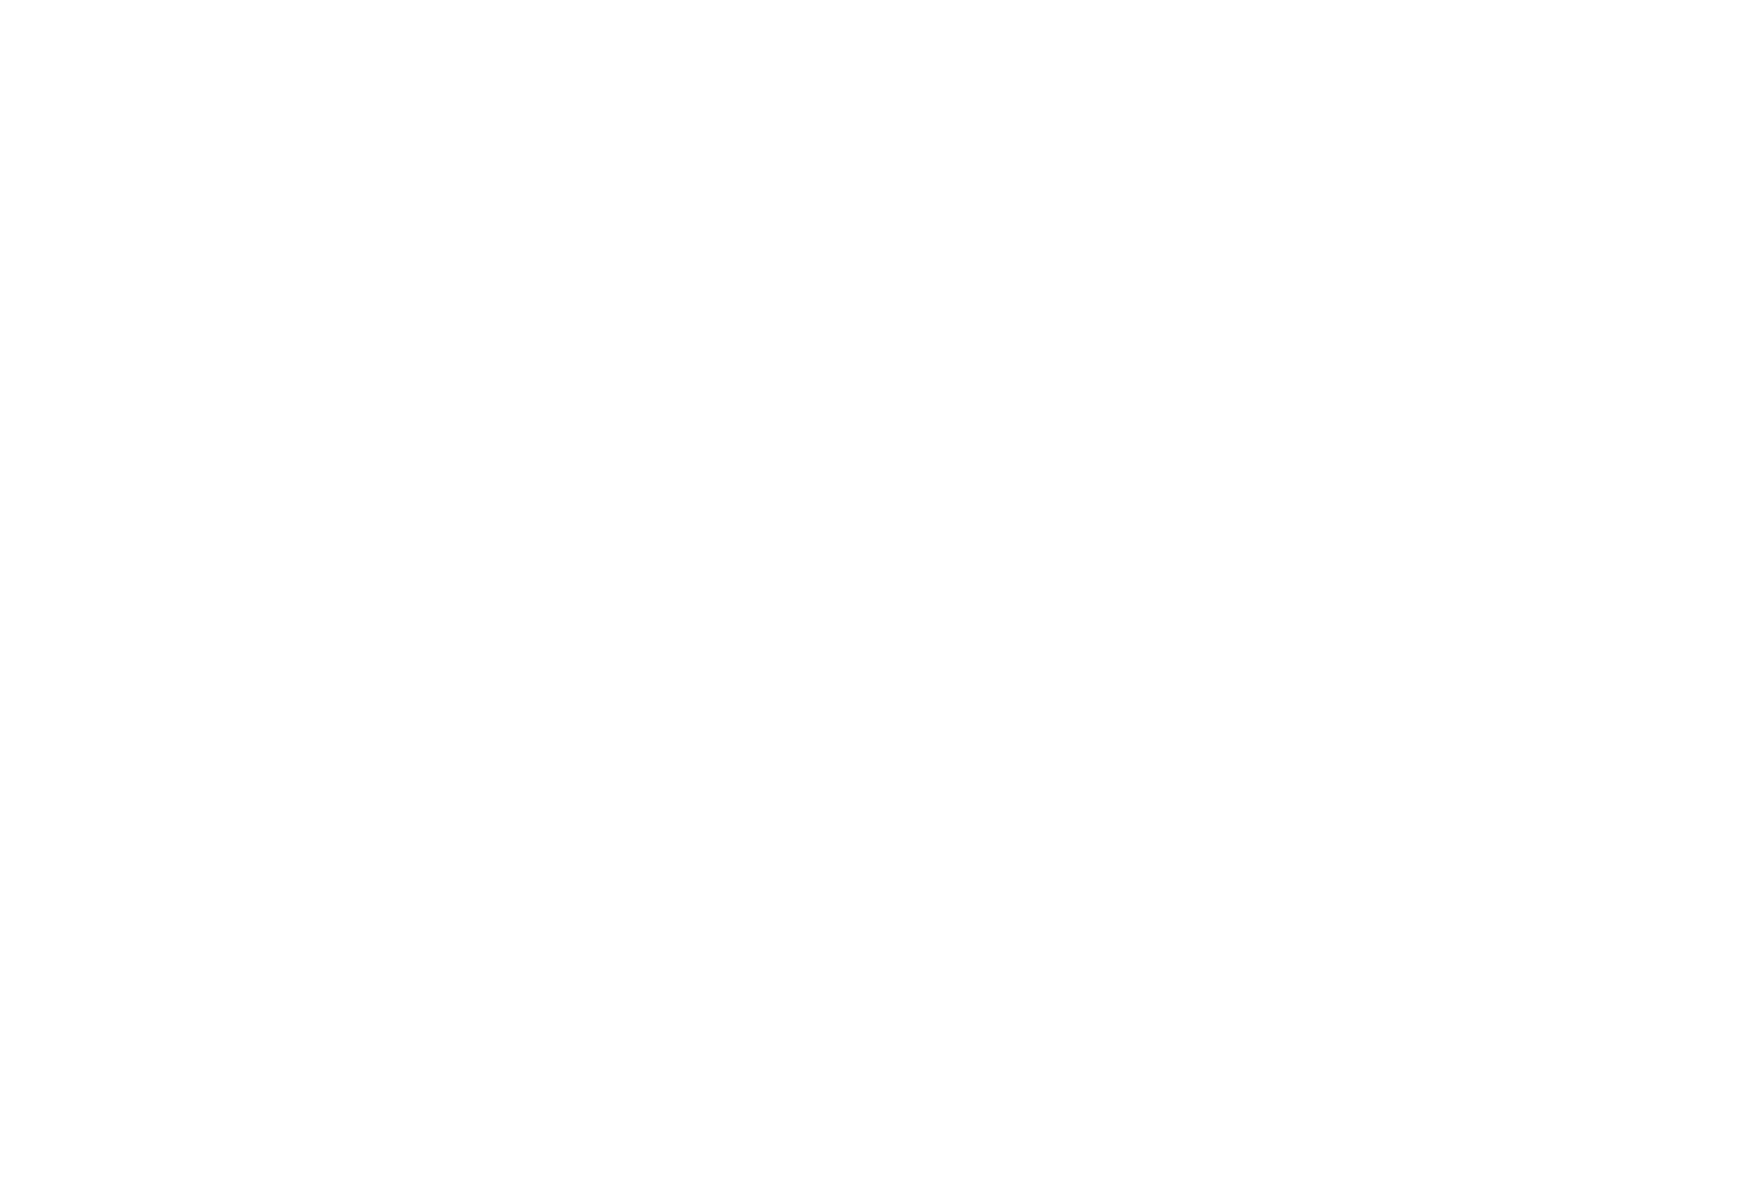 2k-logo-white